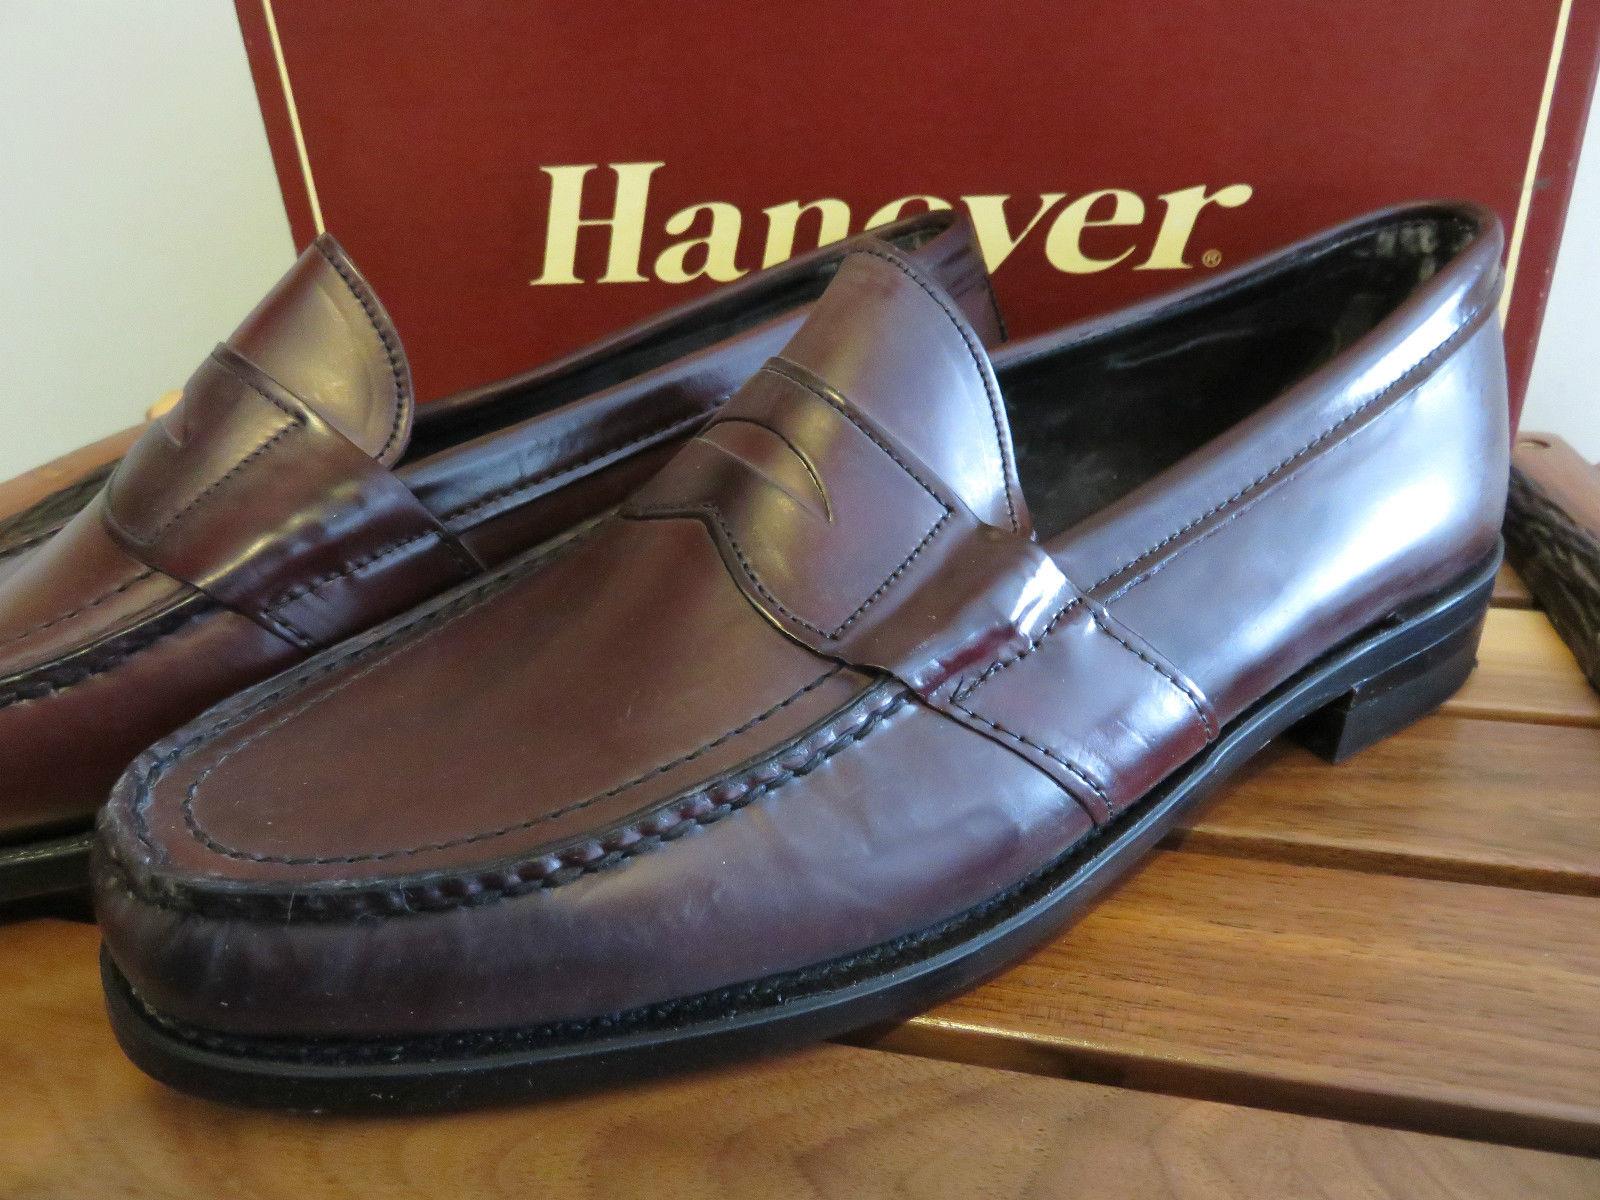 Hanover 2522 Handsewn Moccasin